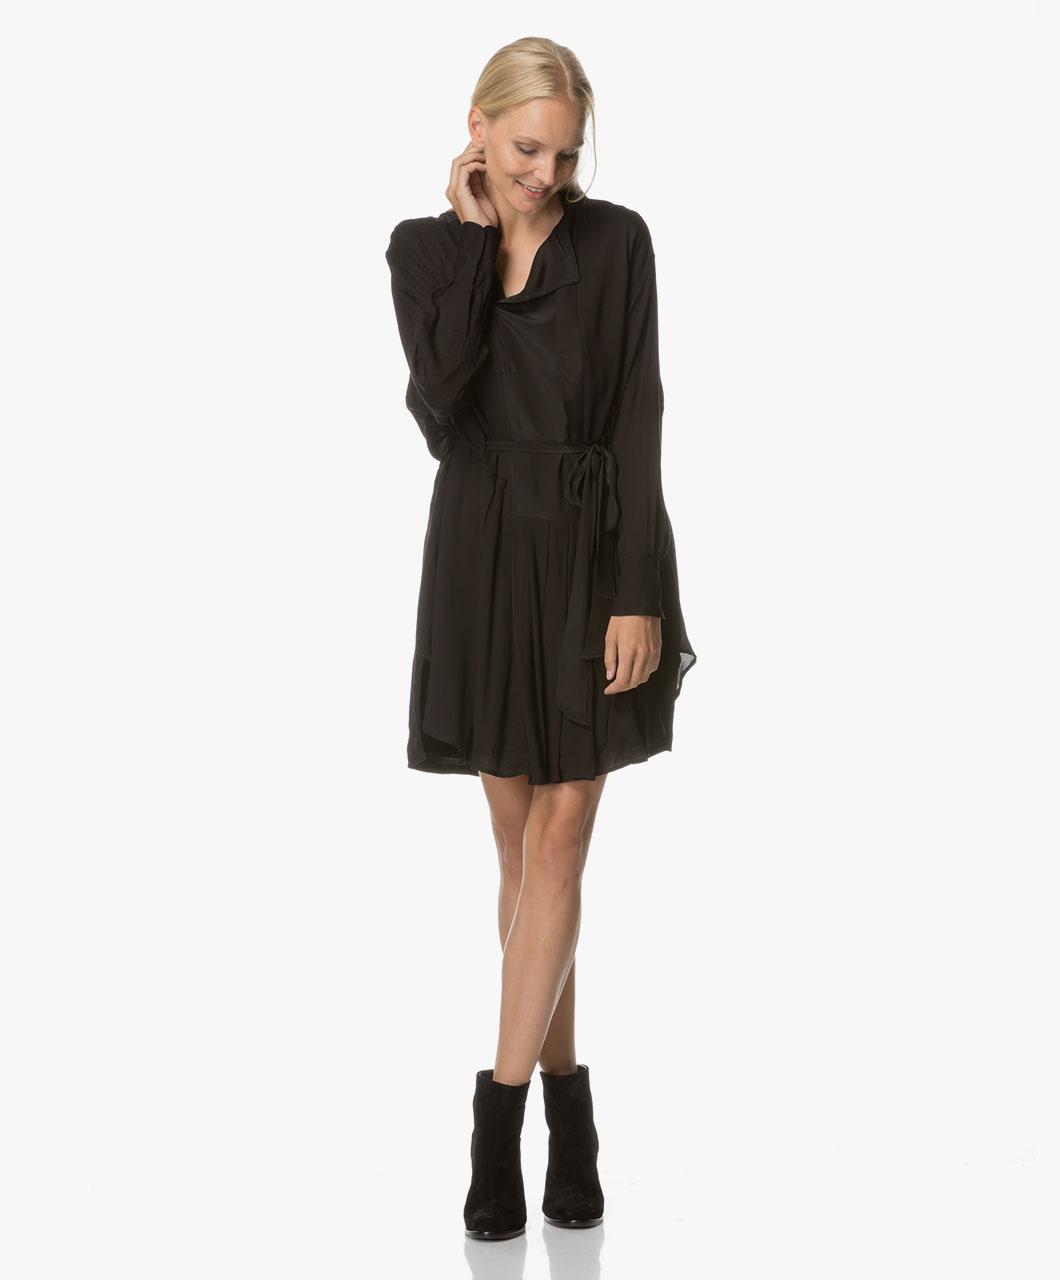 Image of Magali Pascal Dress Black Phoenix